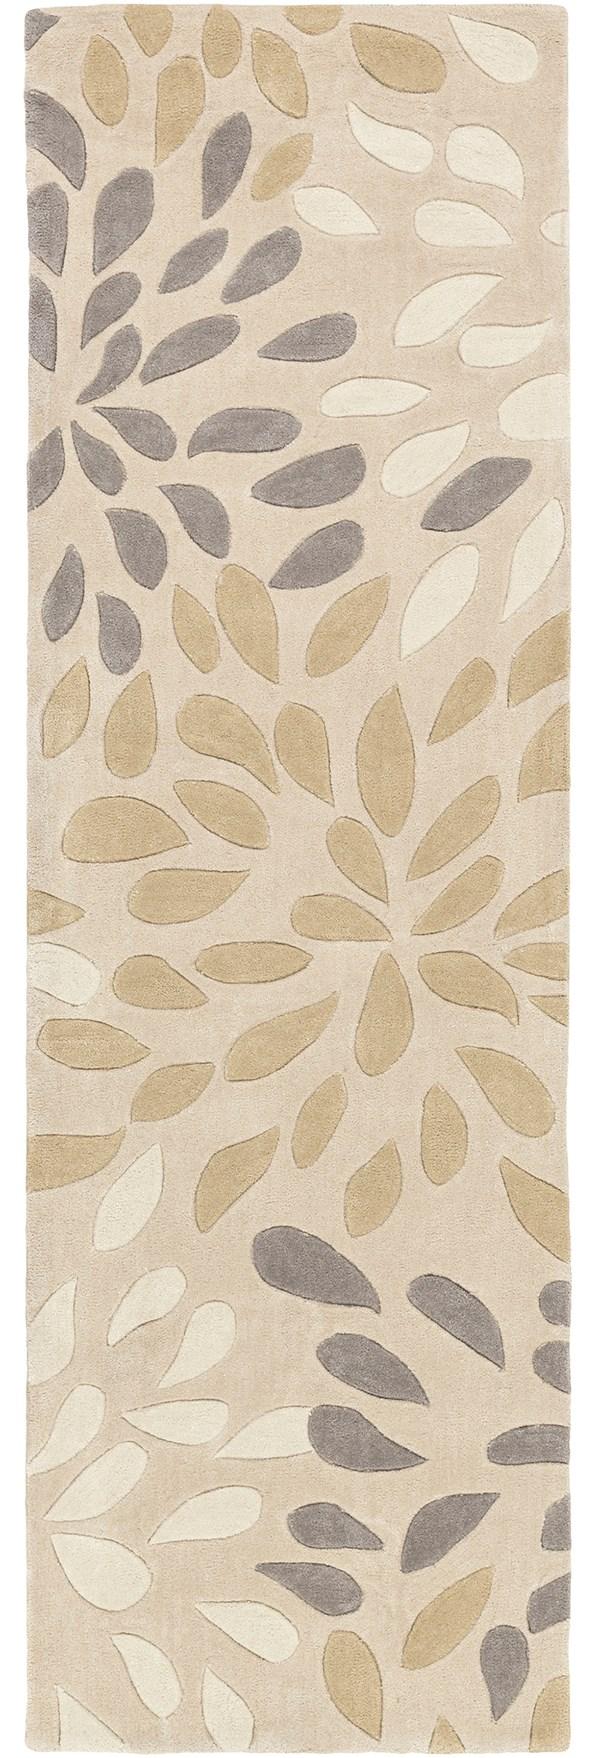 Beige, Khaki, Medium Gray, Cream Contemporary / Modern Area Rug